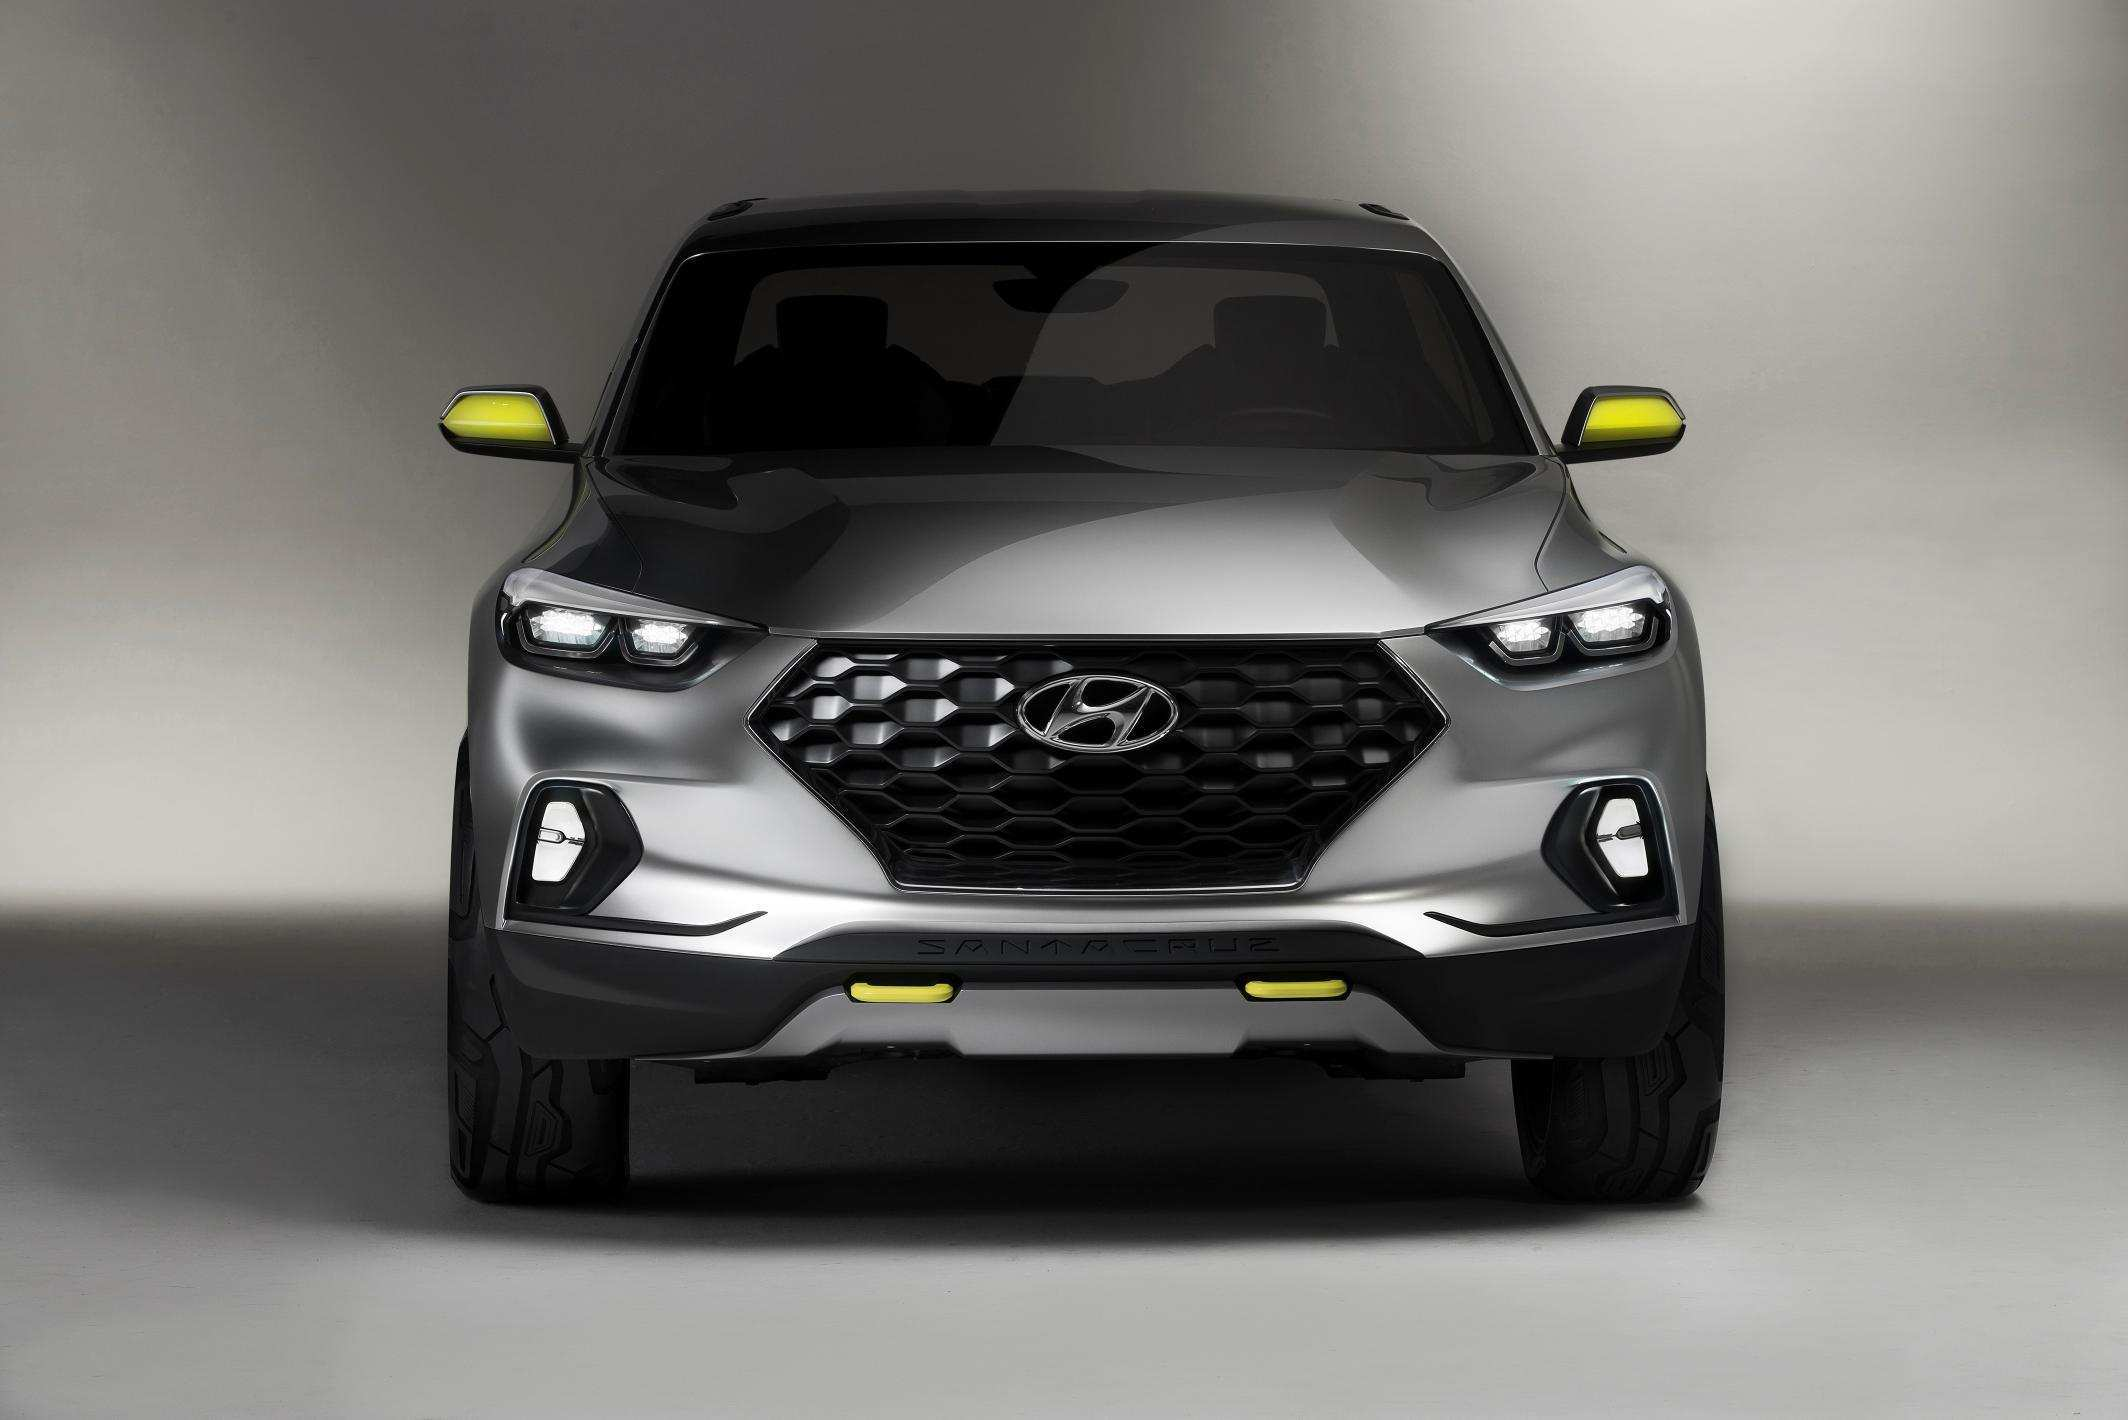 84 Concept of Hyundai Pickup 2020 Pictures by Hyundai Pickup 2020